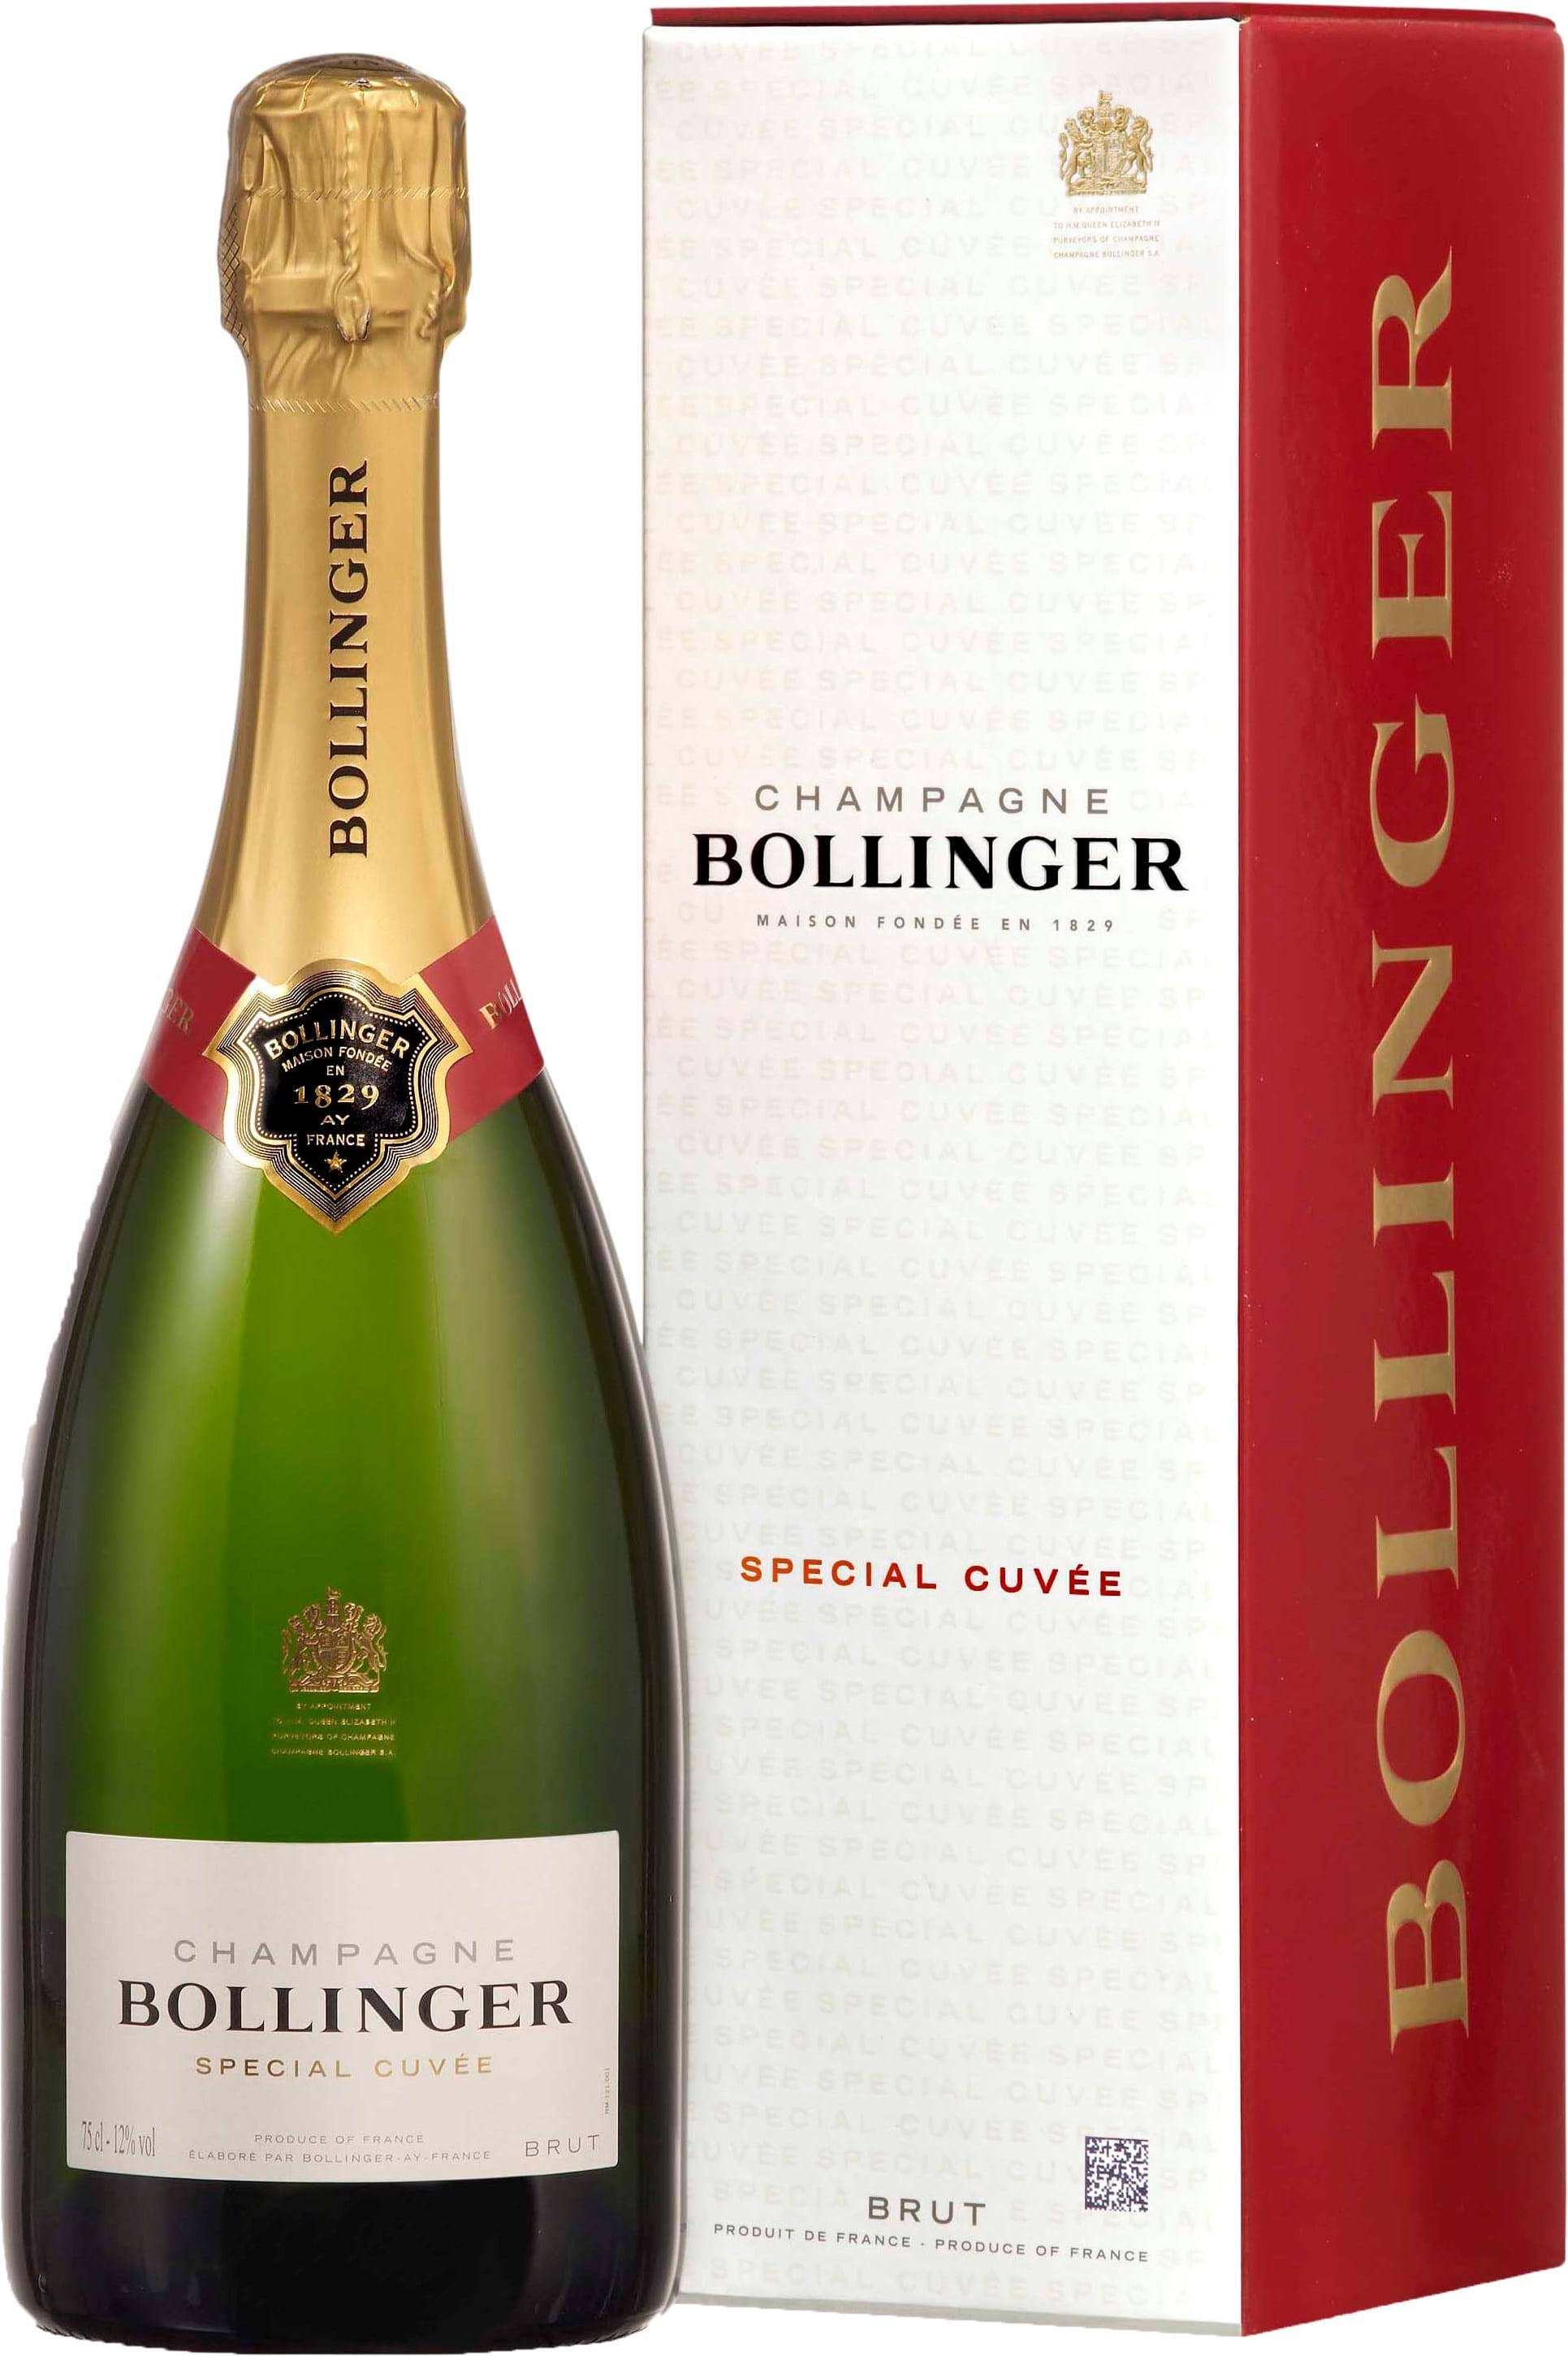 Rask Bollinger, Special Cuvée, Champagne, AOC brut, white (gift box) 0.75L PC-14